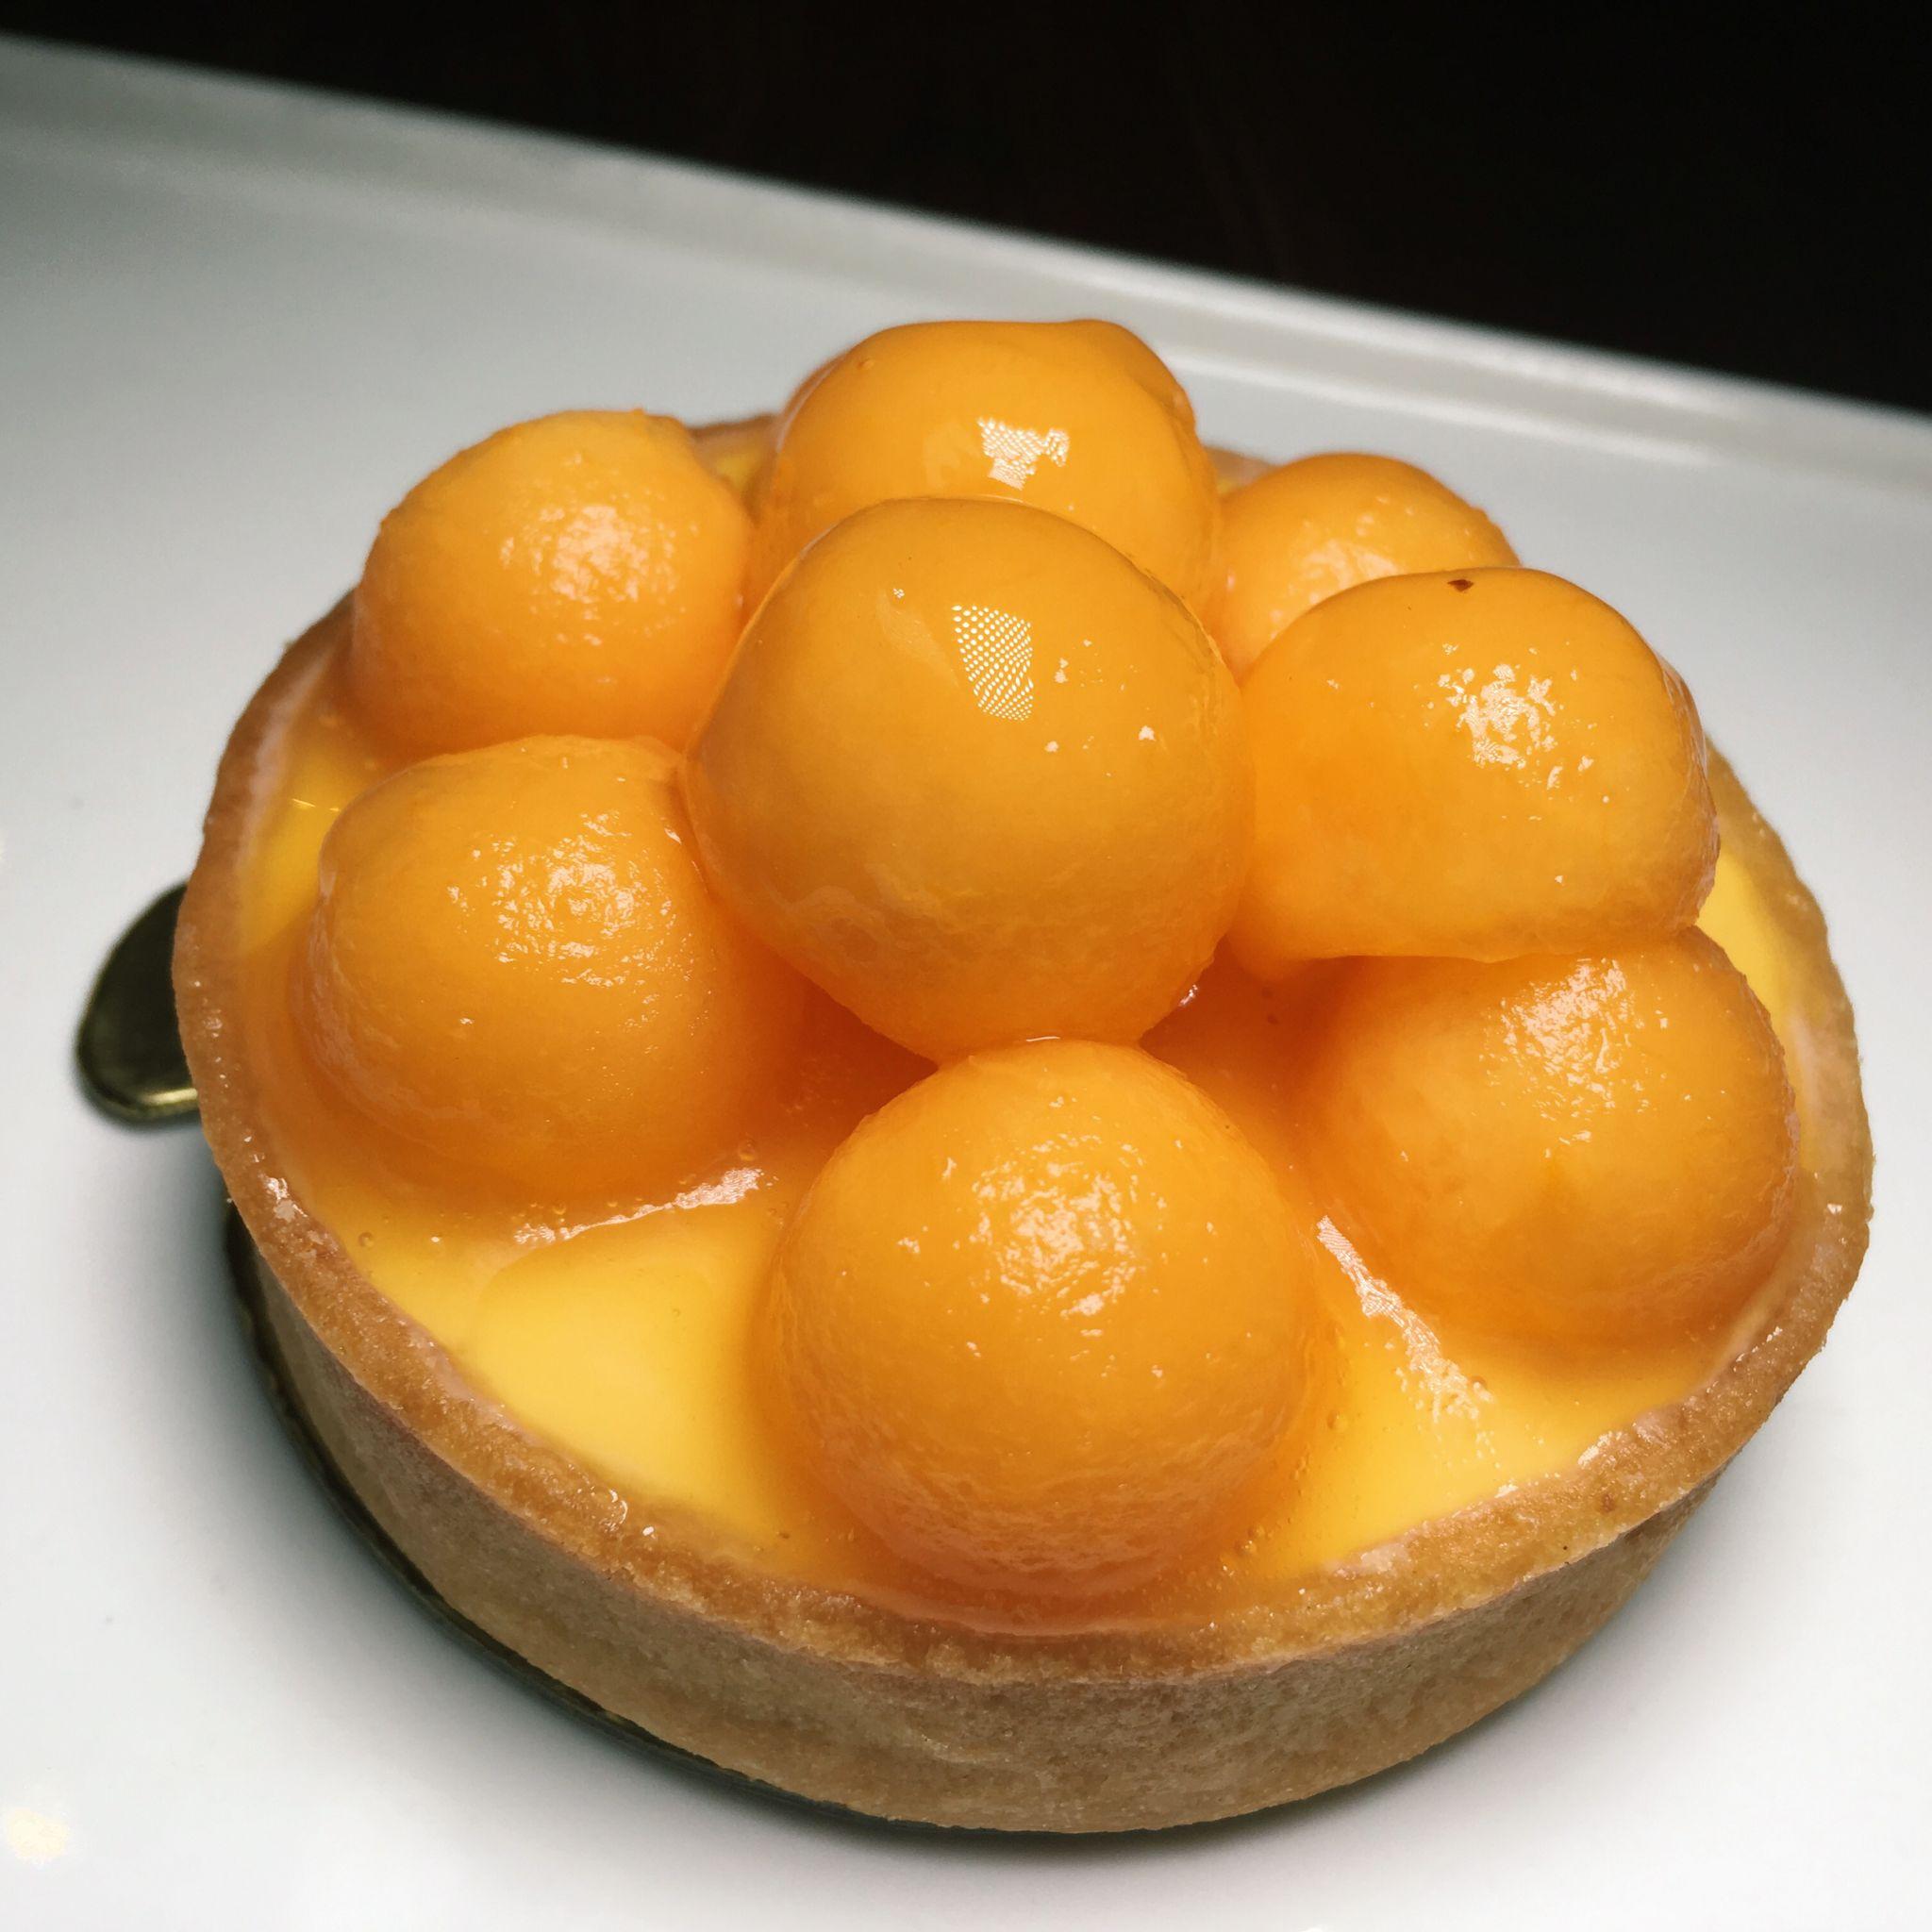 Cavaillon Melon - Tarte by Cheryl Koh